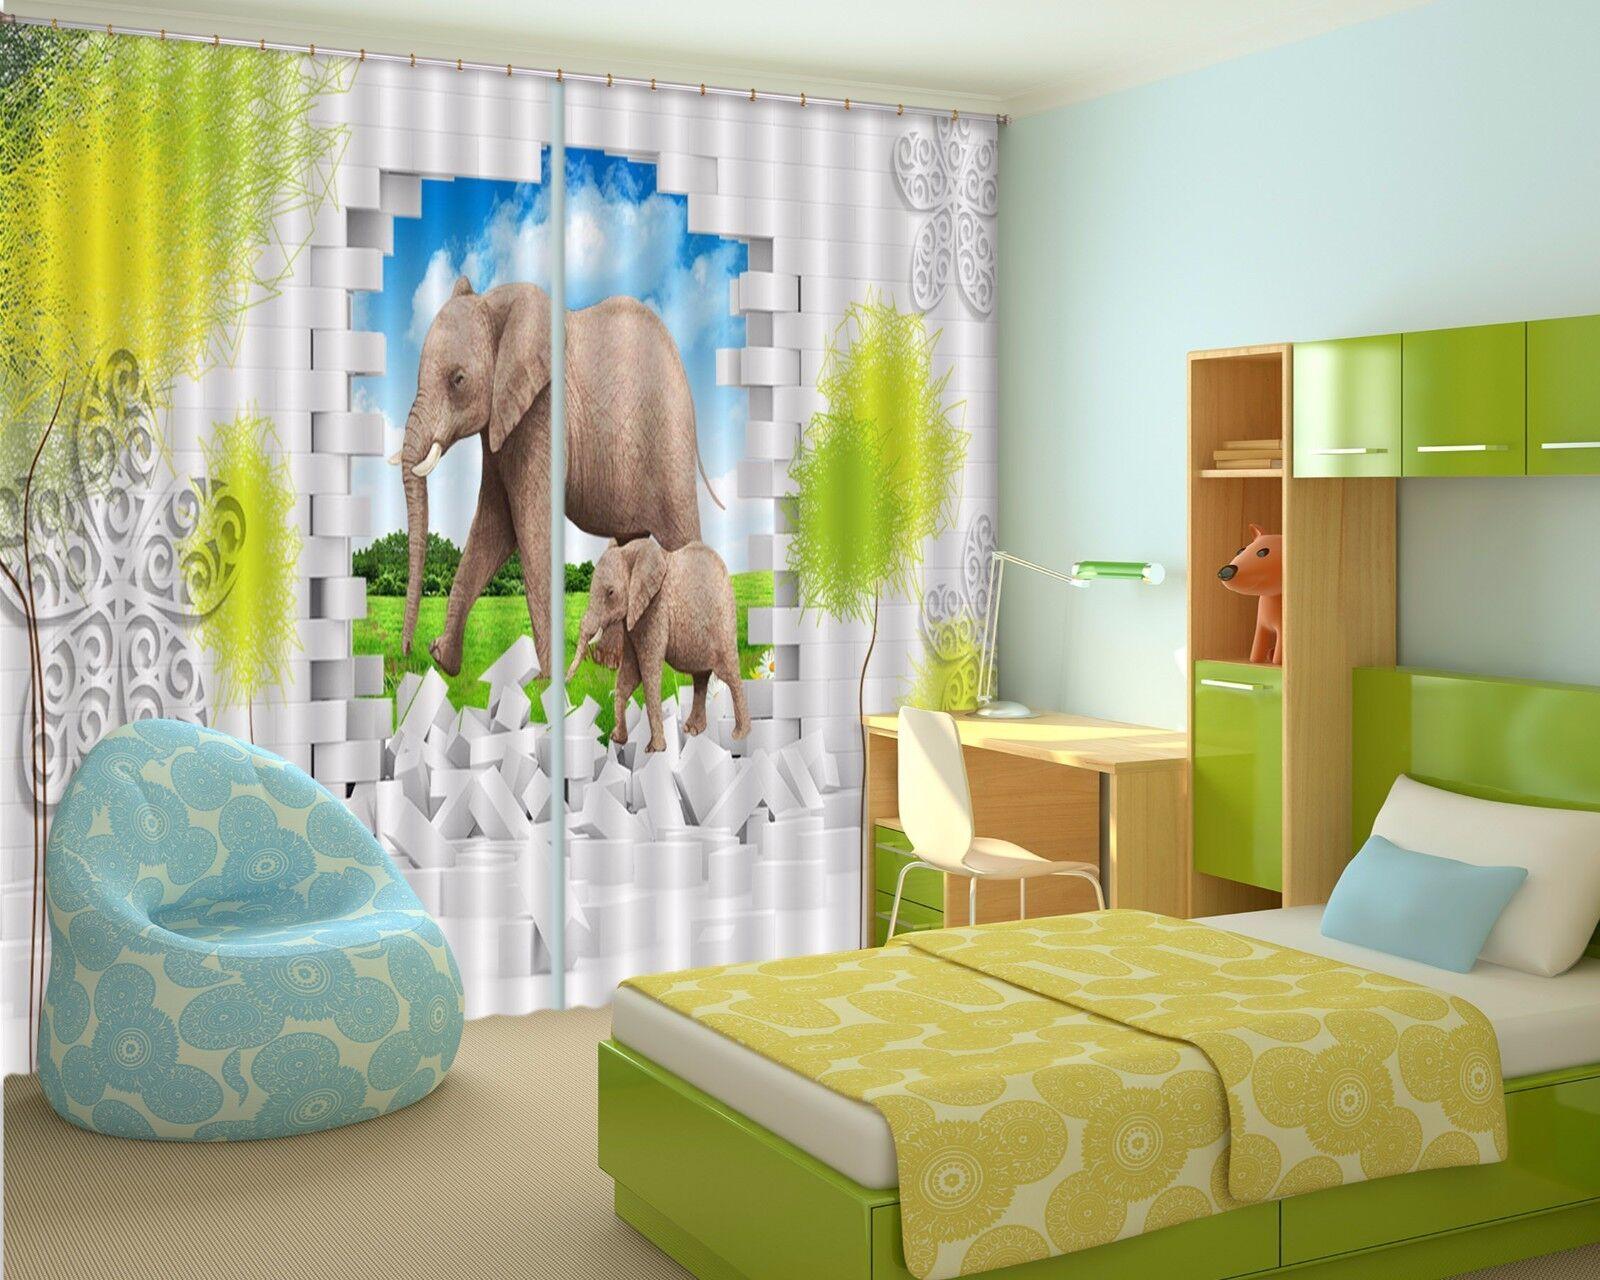 Elefante 3D 002 Cortinas de impresión de cortina de foto Blockout Tela Cortinas Ventana Reino Unido